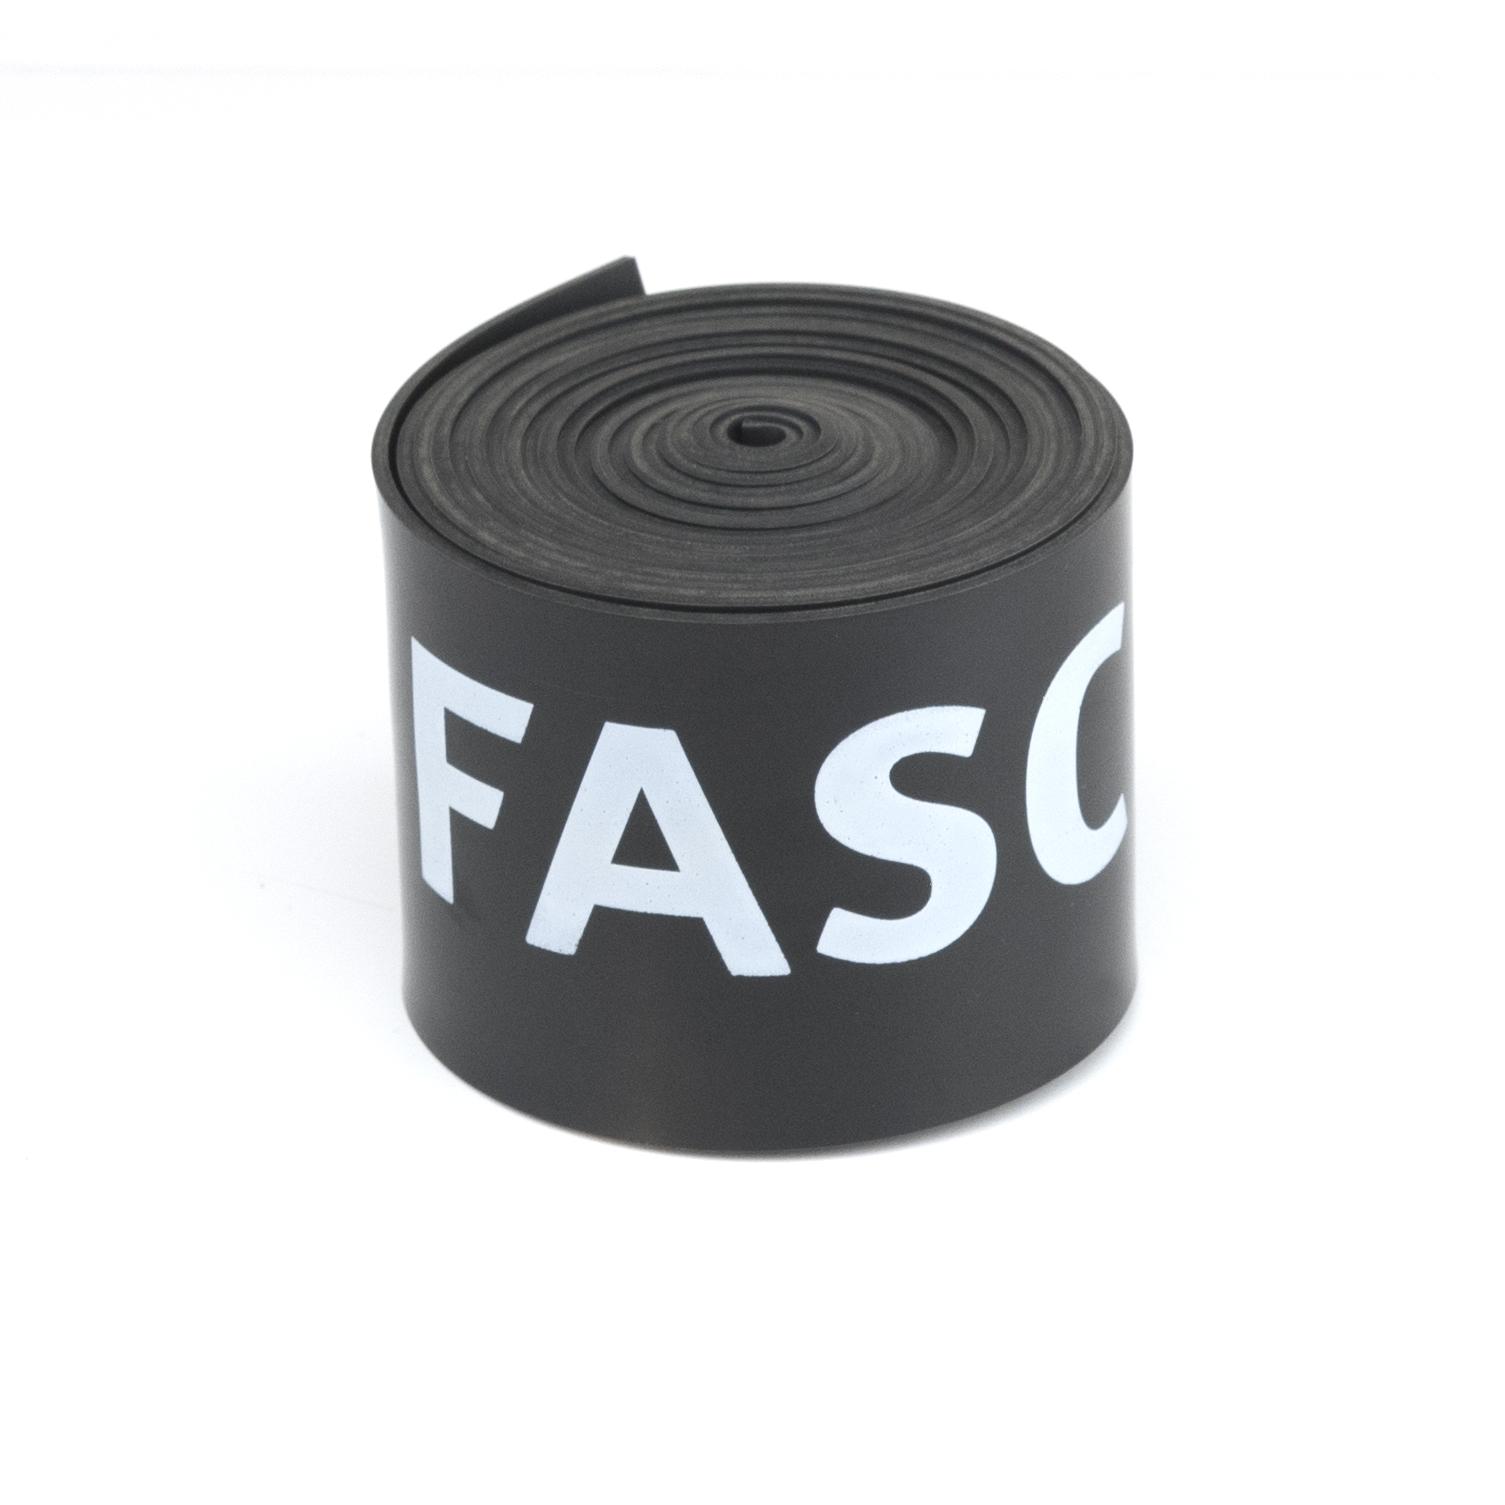 fasciq-flossband-2-5-cm-1-5-mm